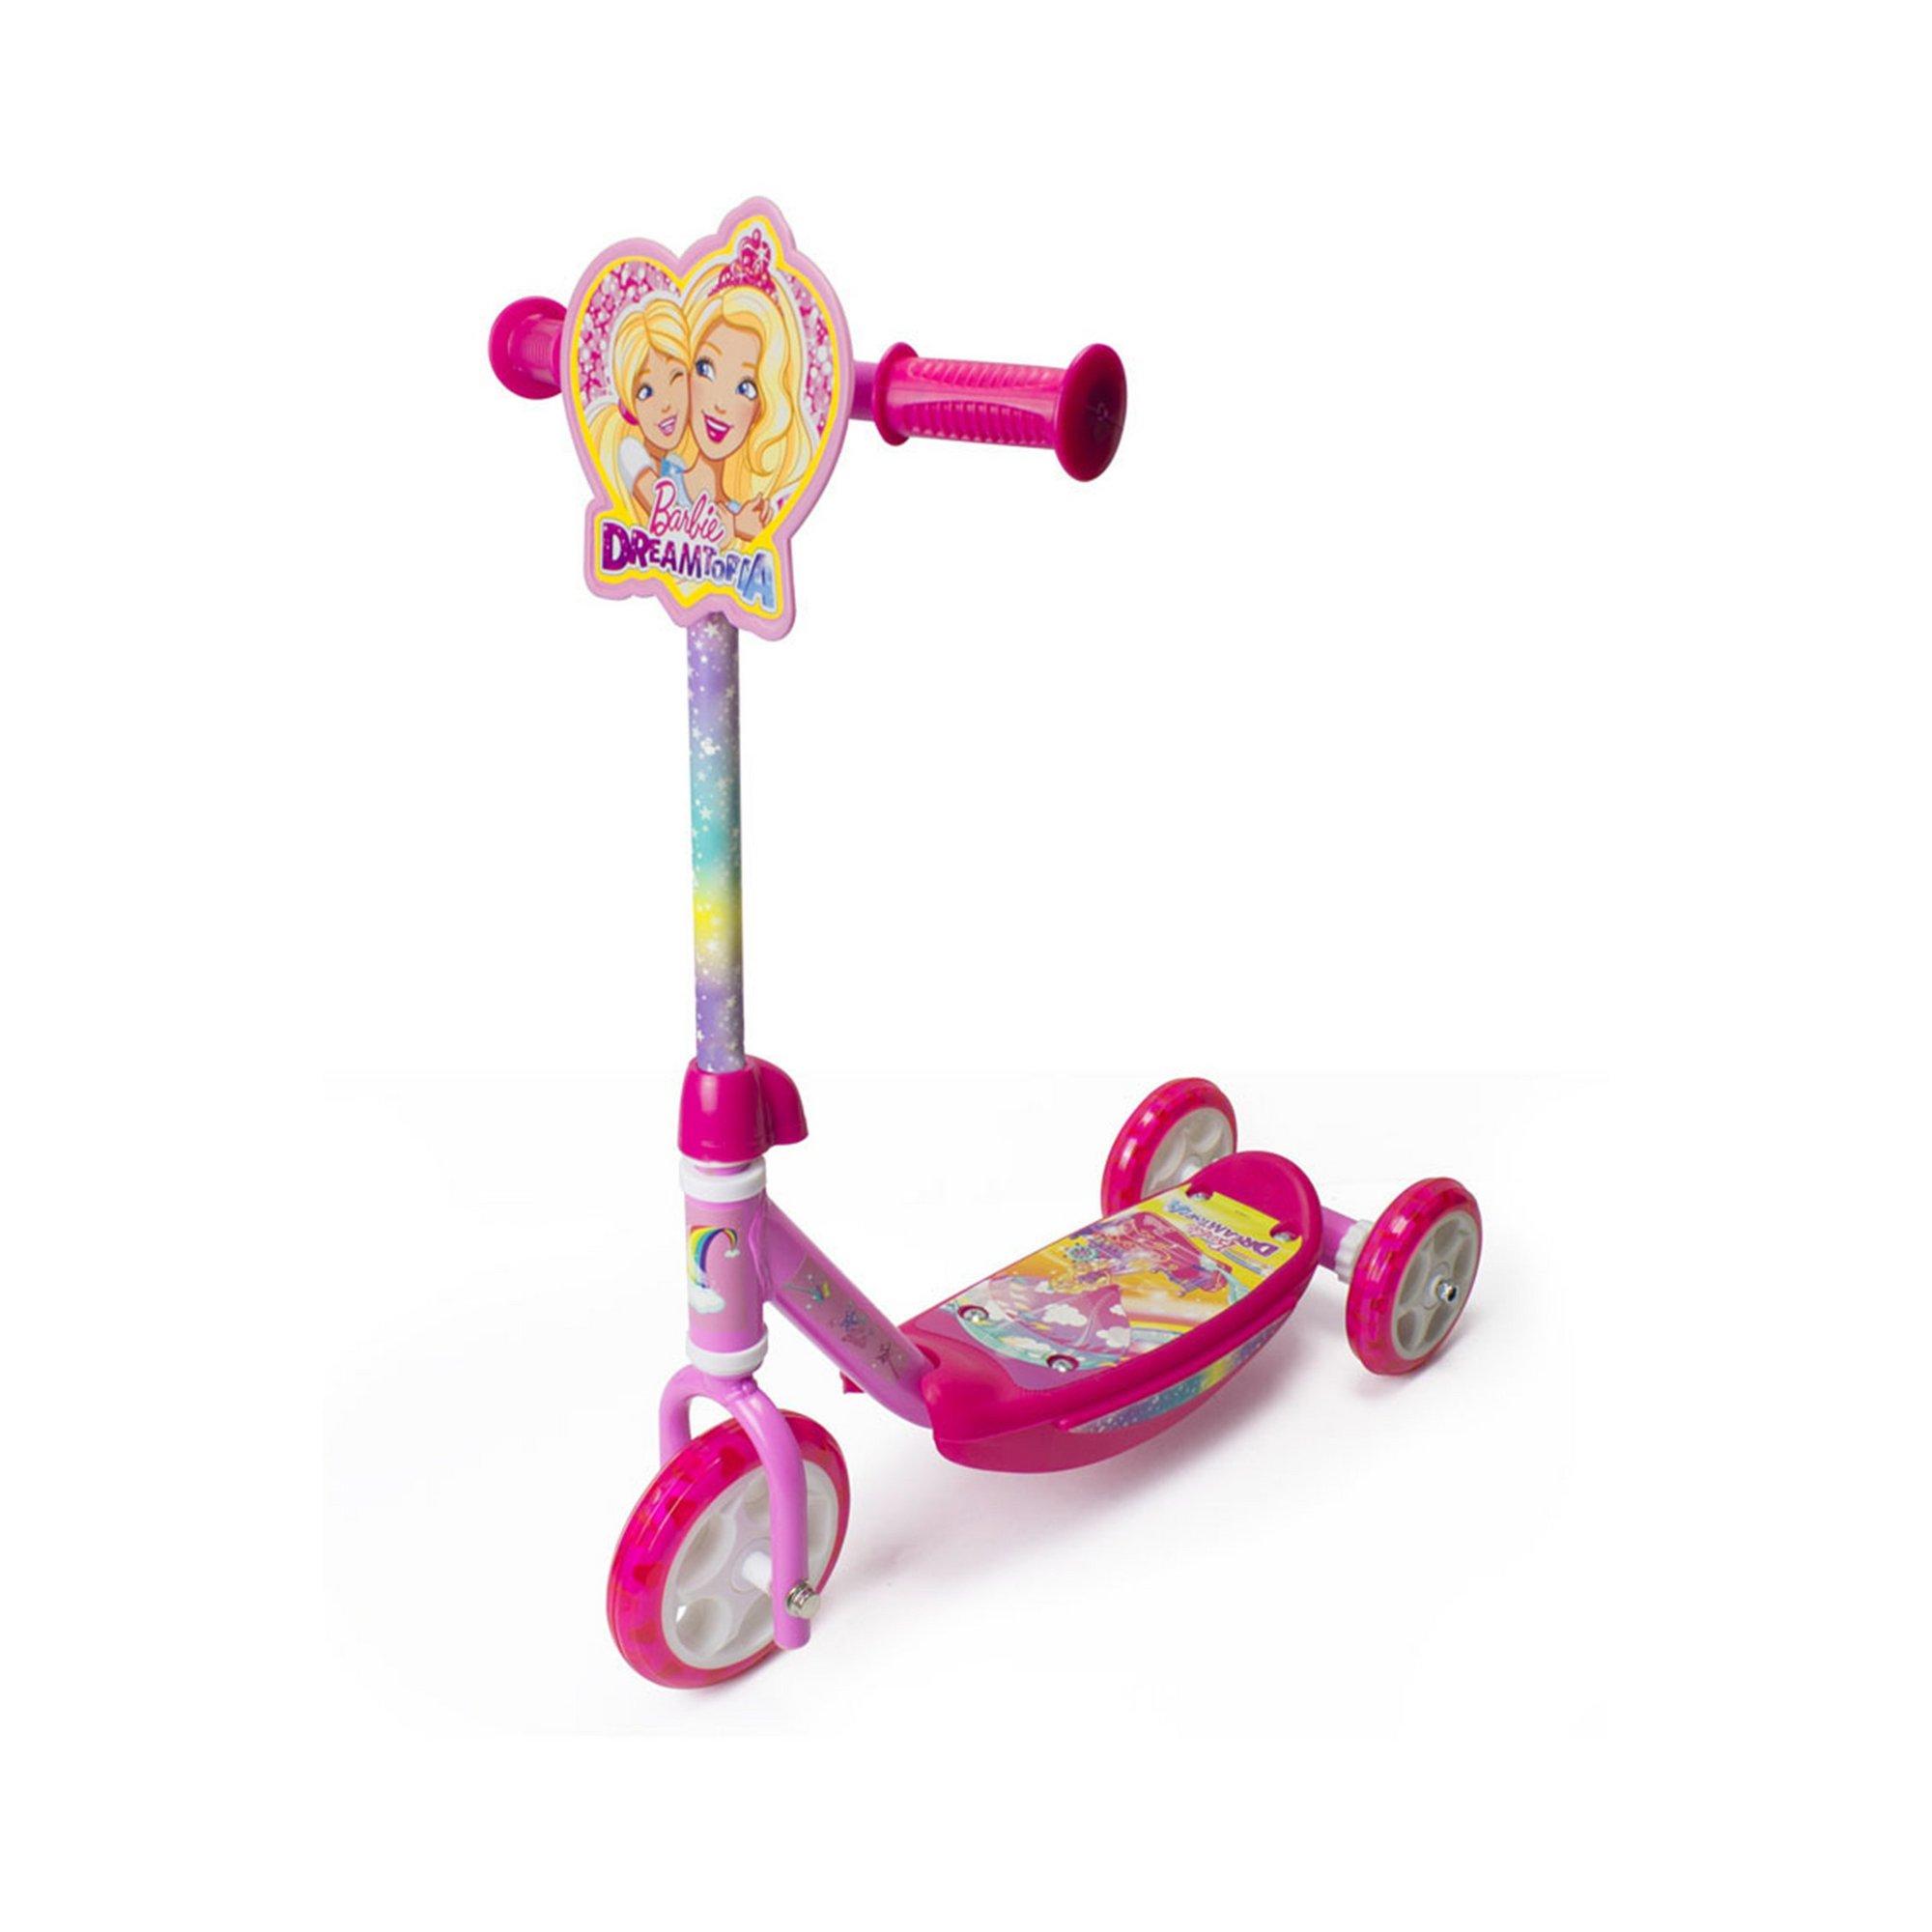 Image of Barbie Dreamtopia Kids Three Wheel Tri Scooter